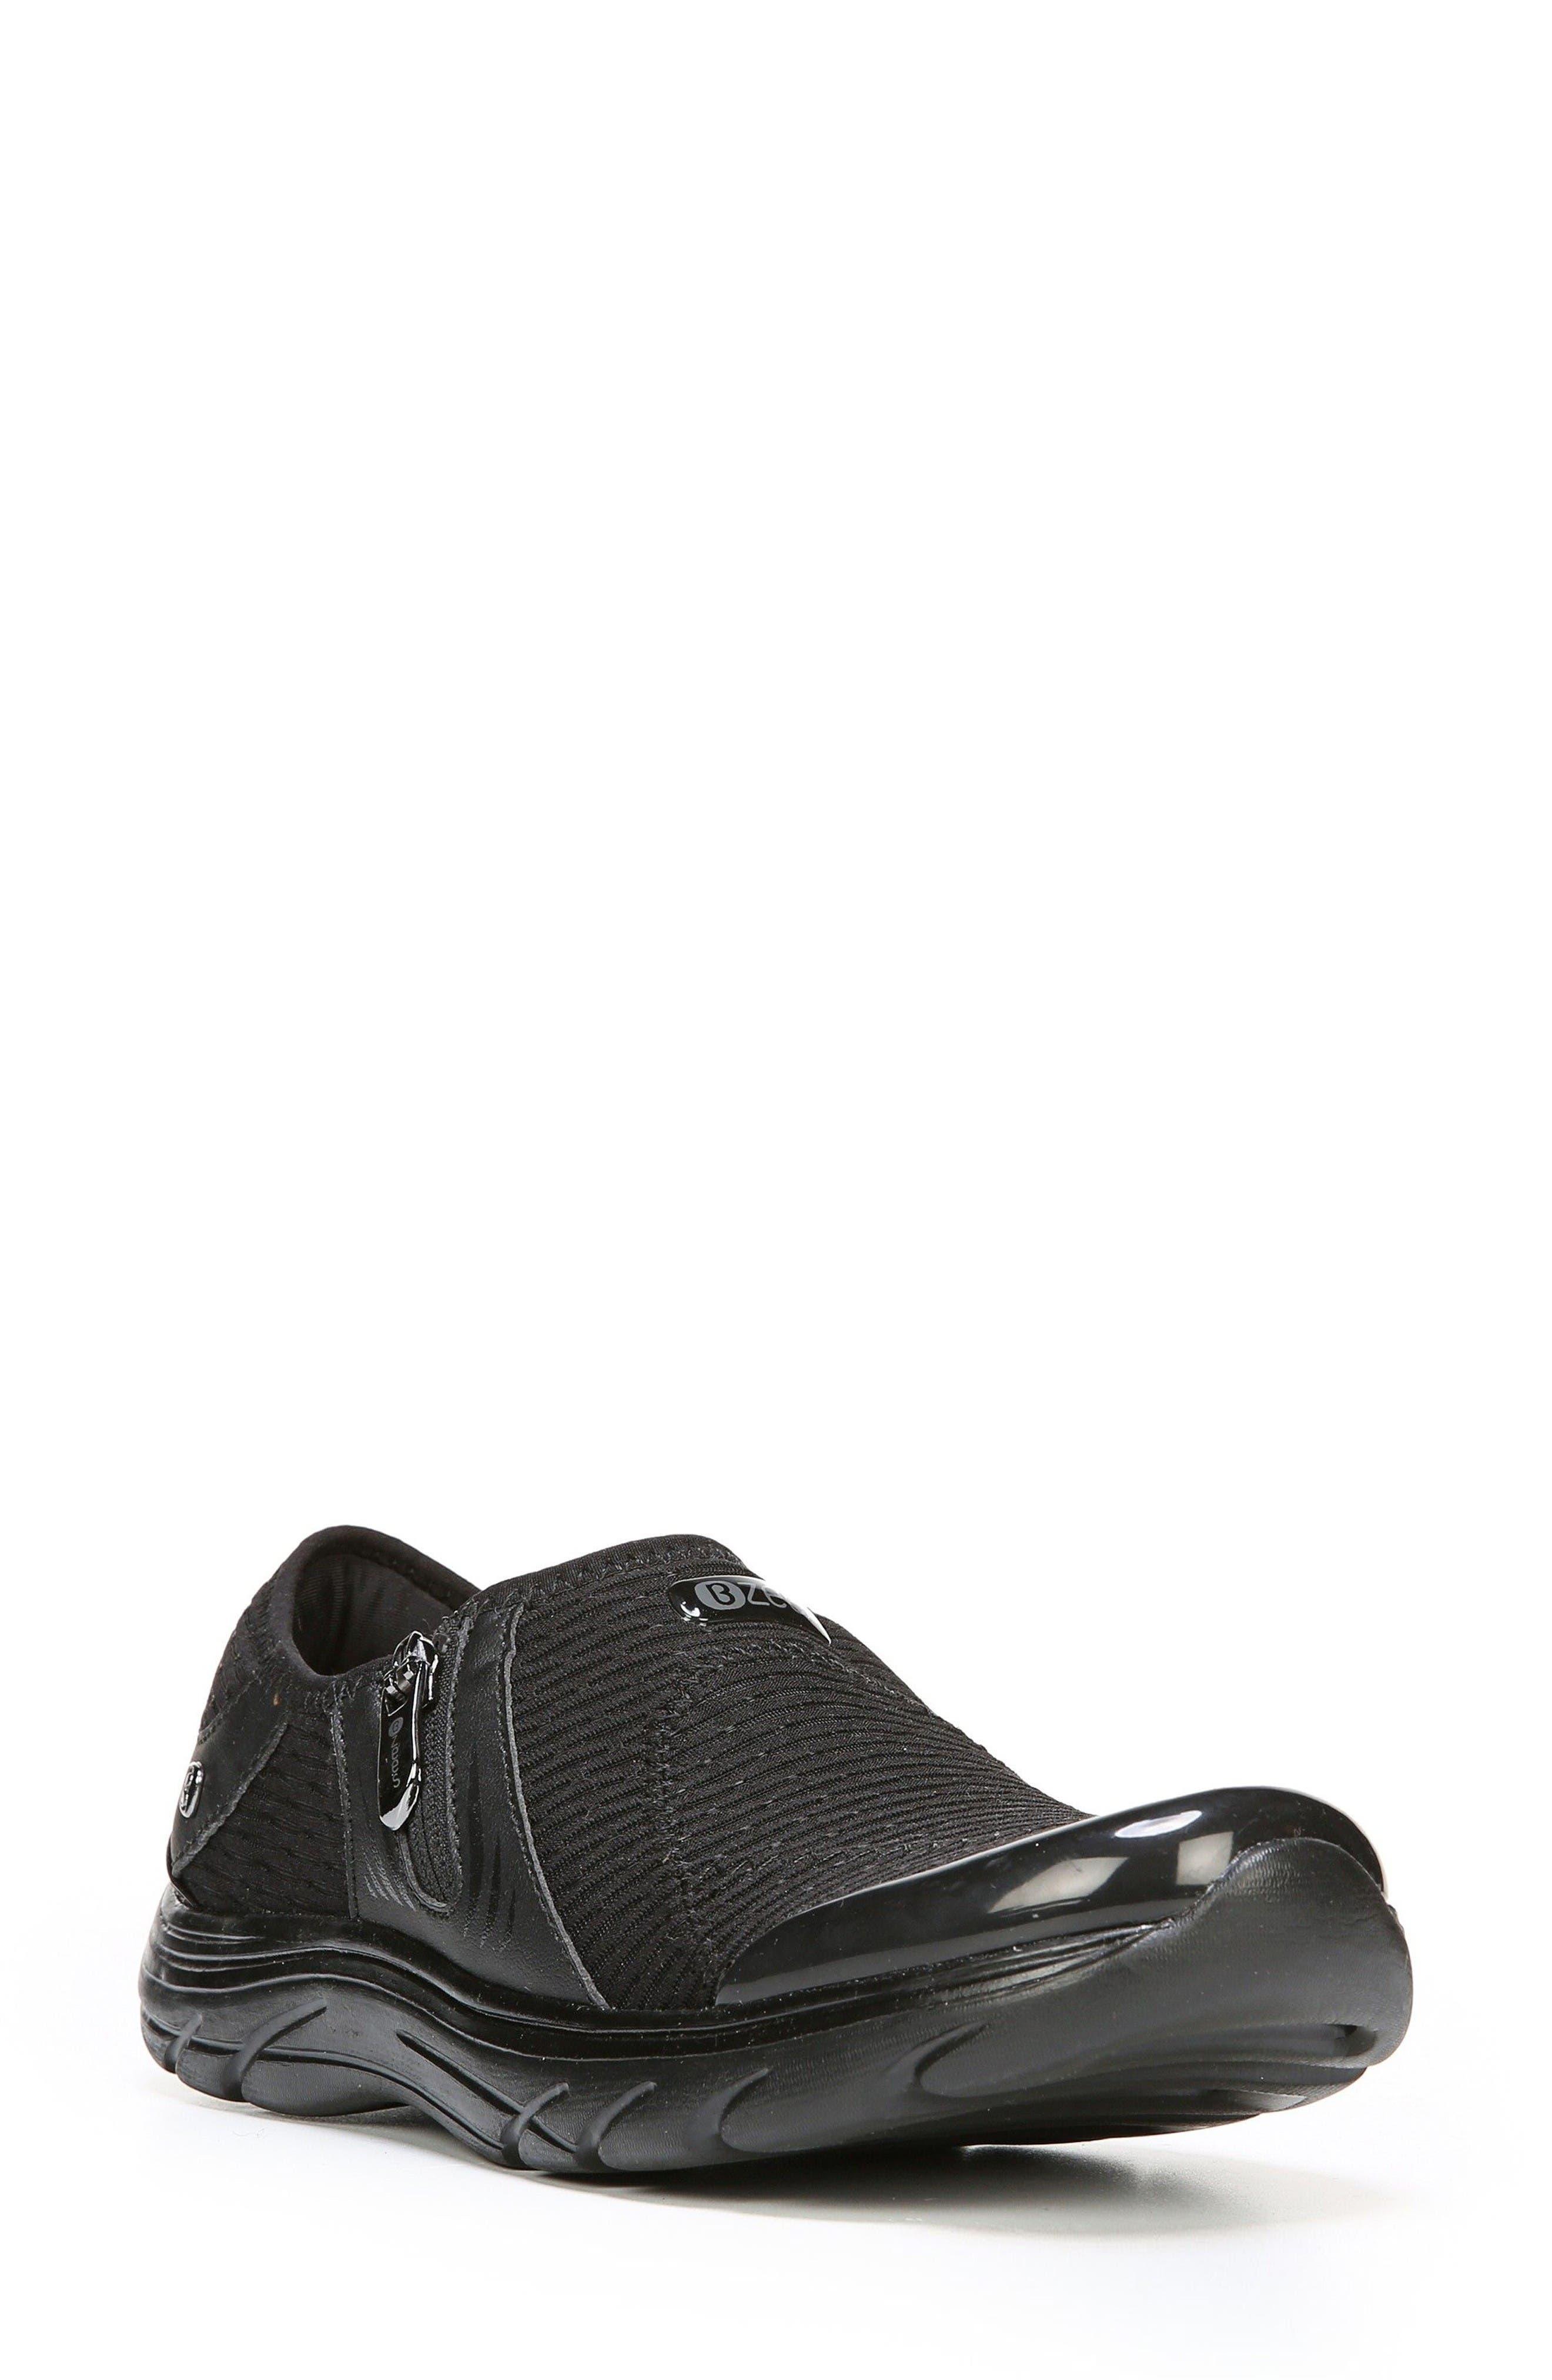 Balance Sneaker,                             Main thumbnail 1, color,                             Black Oval Fabric